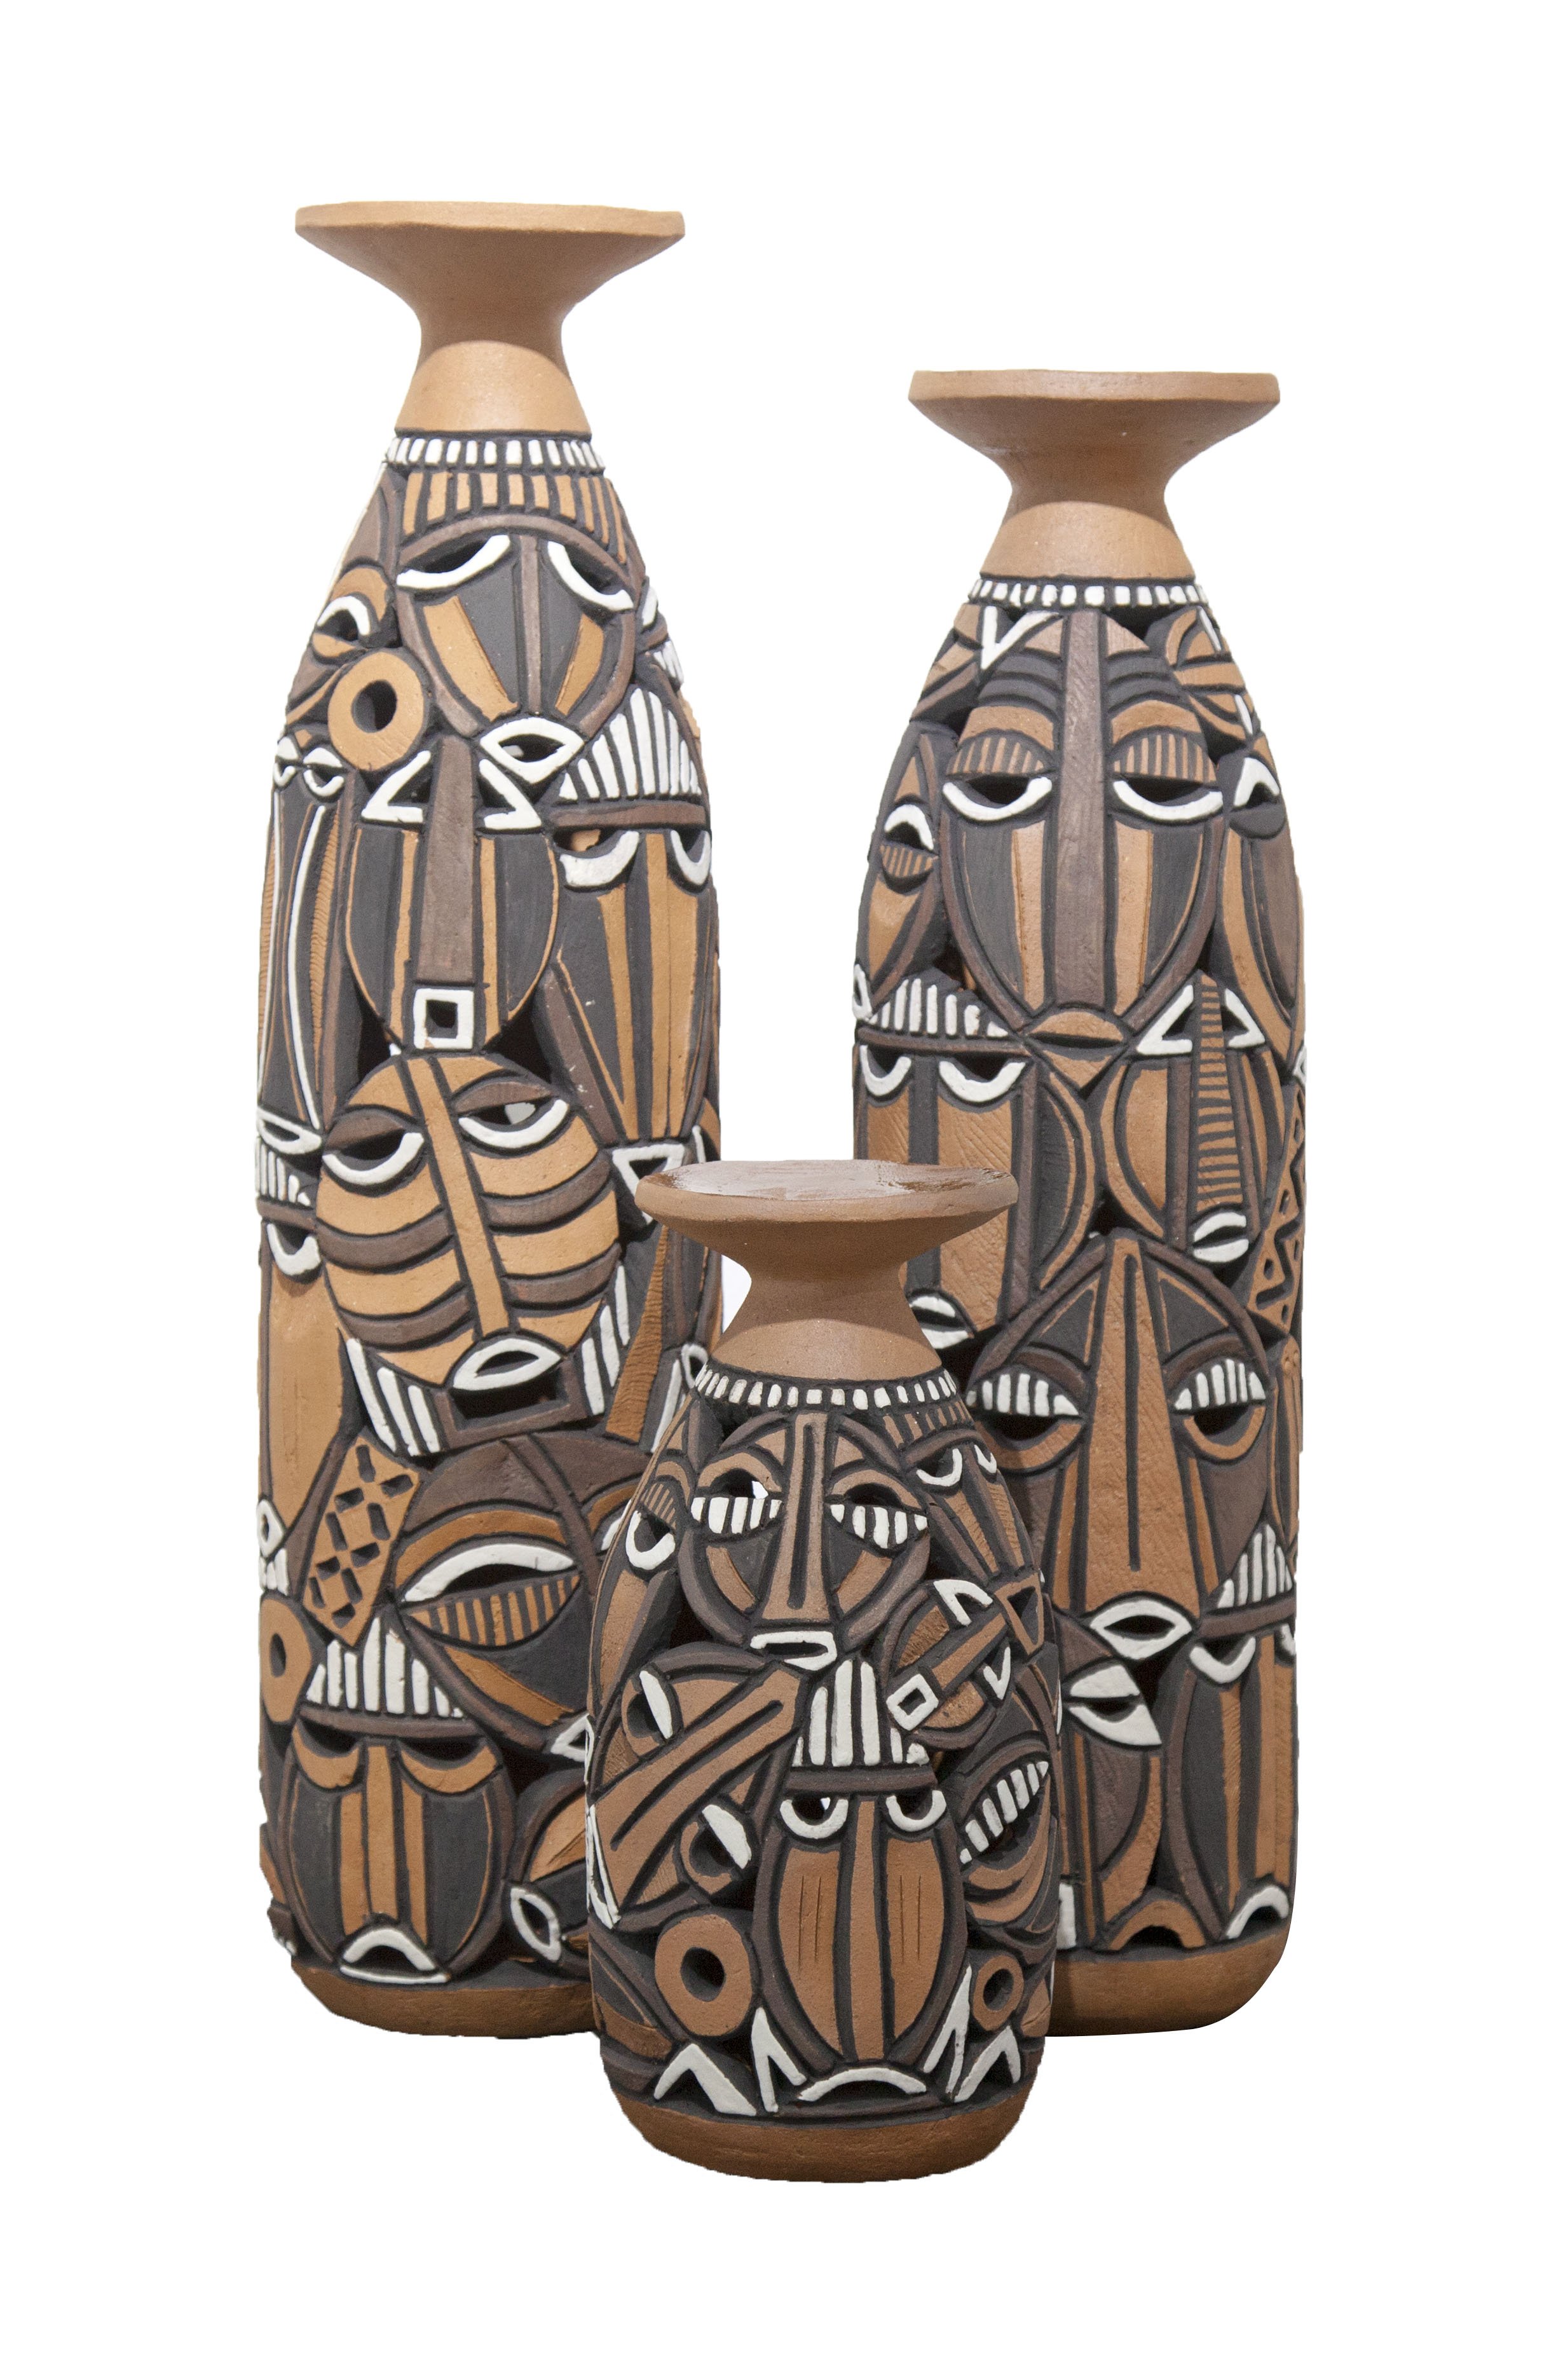 Family Texture II, Naked clay, 58 x 14 cm, 53 x 14 cm, 29 x 14cm, 2019, Nathalie Djakou Kassi